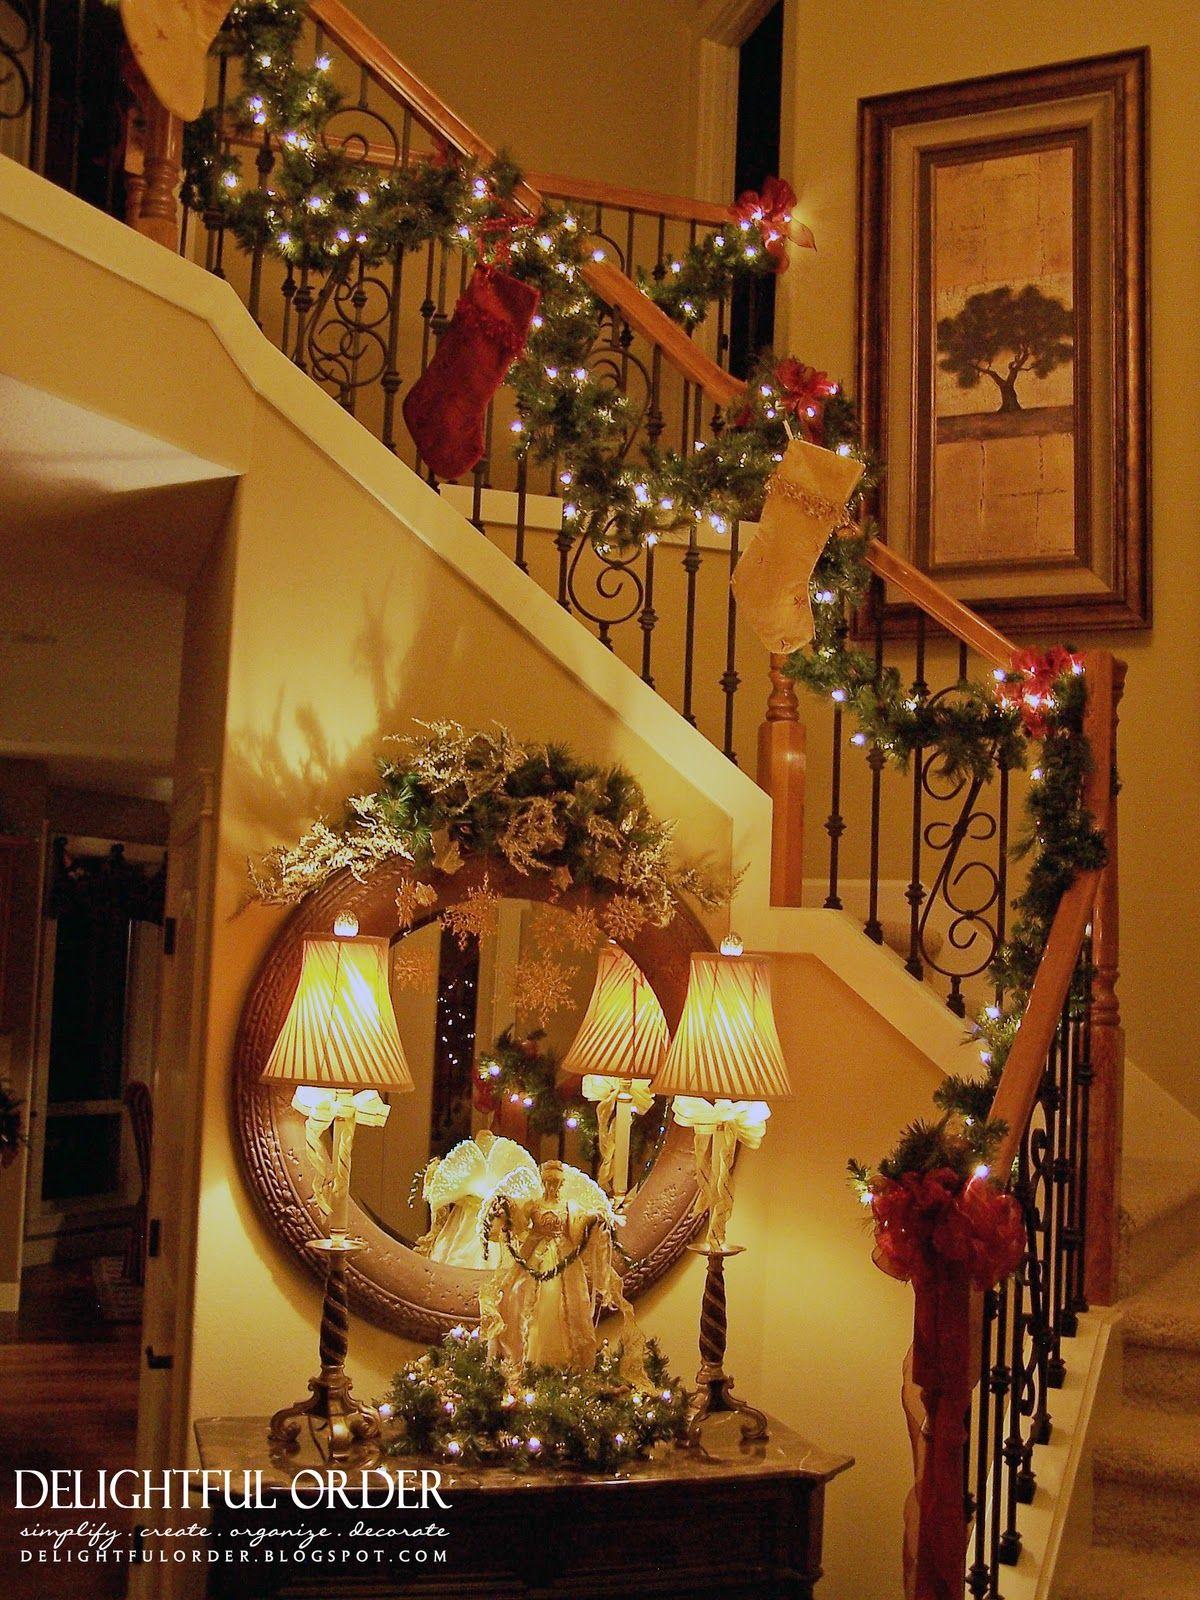 Foyer Christmas Decorating : Delightful order staircase christmas decorating i like